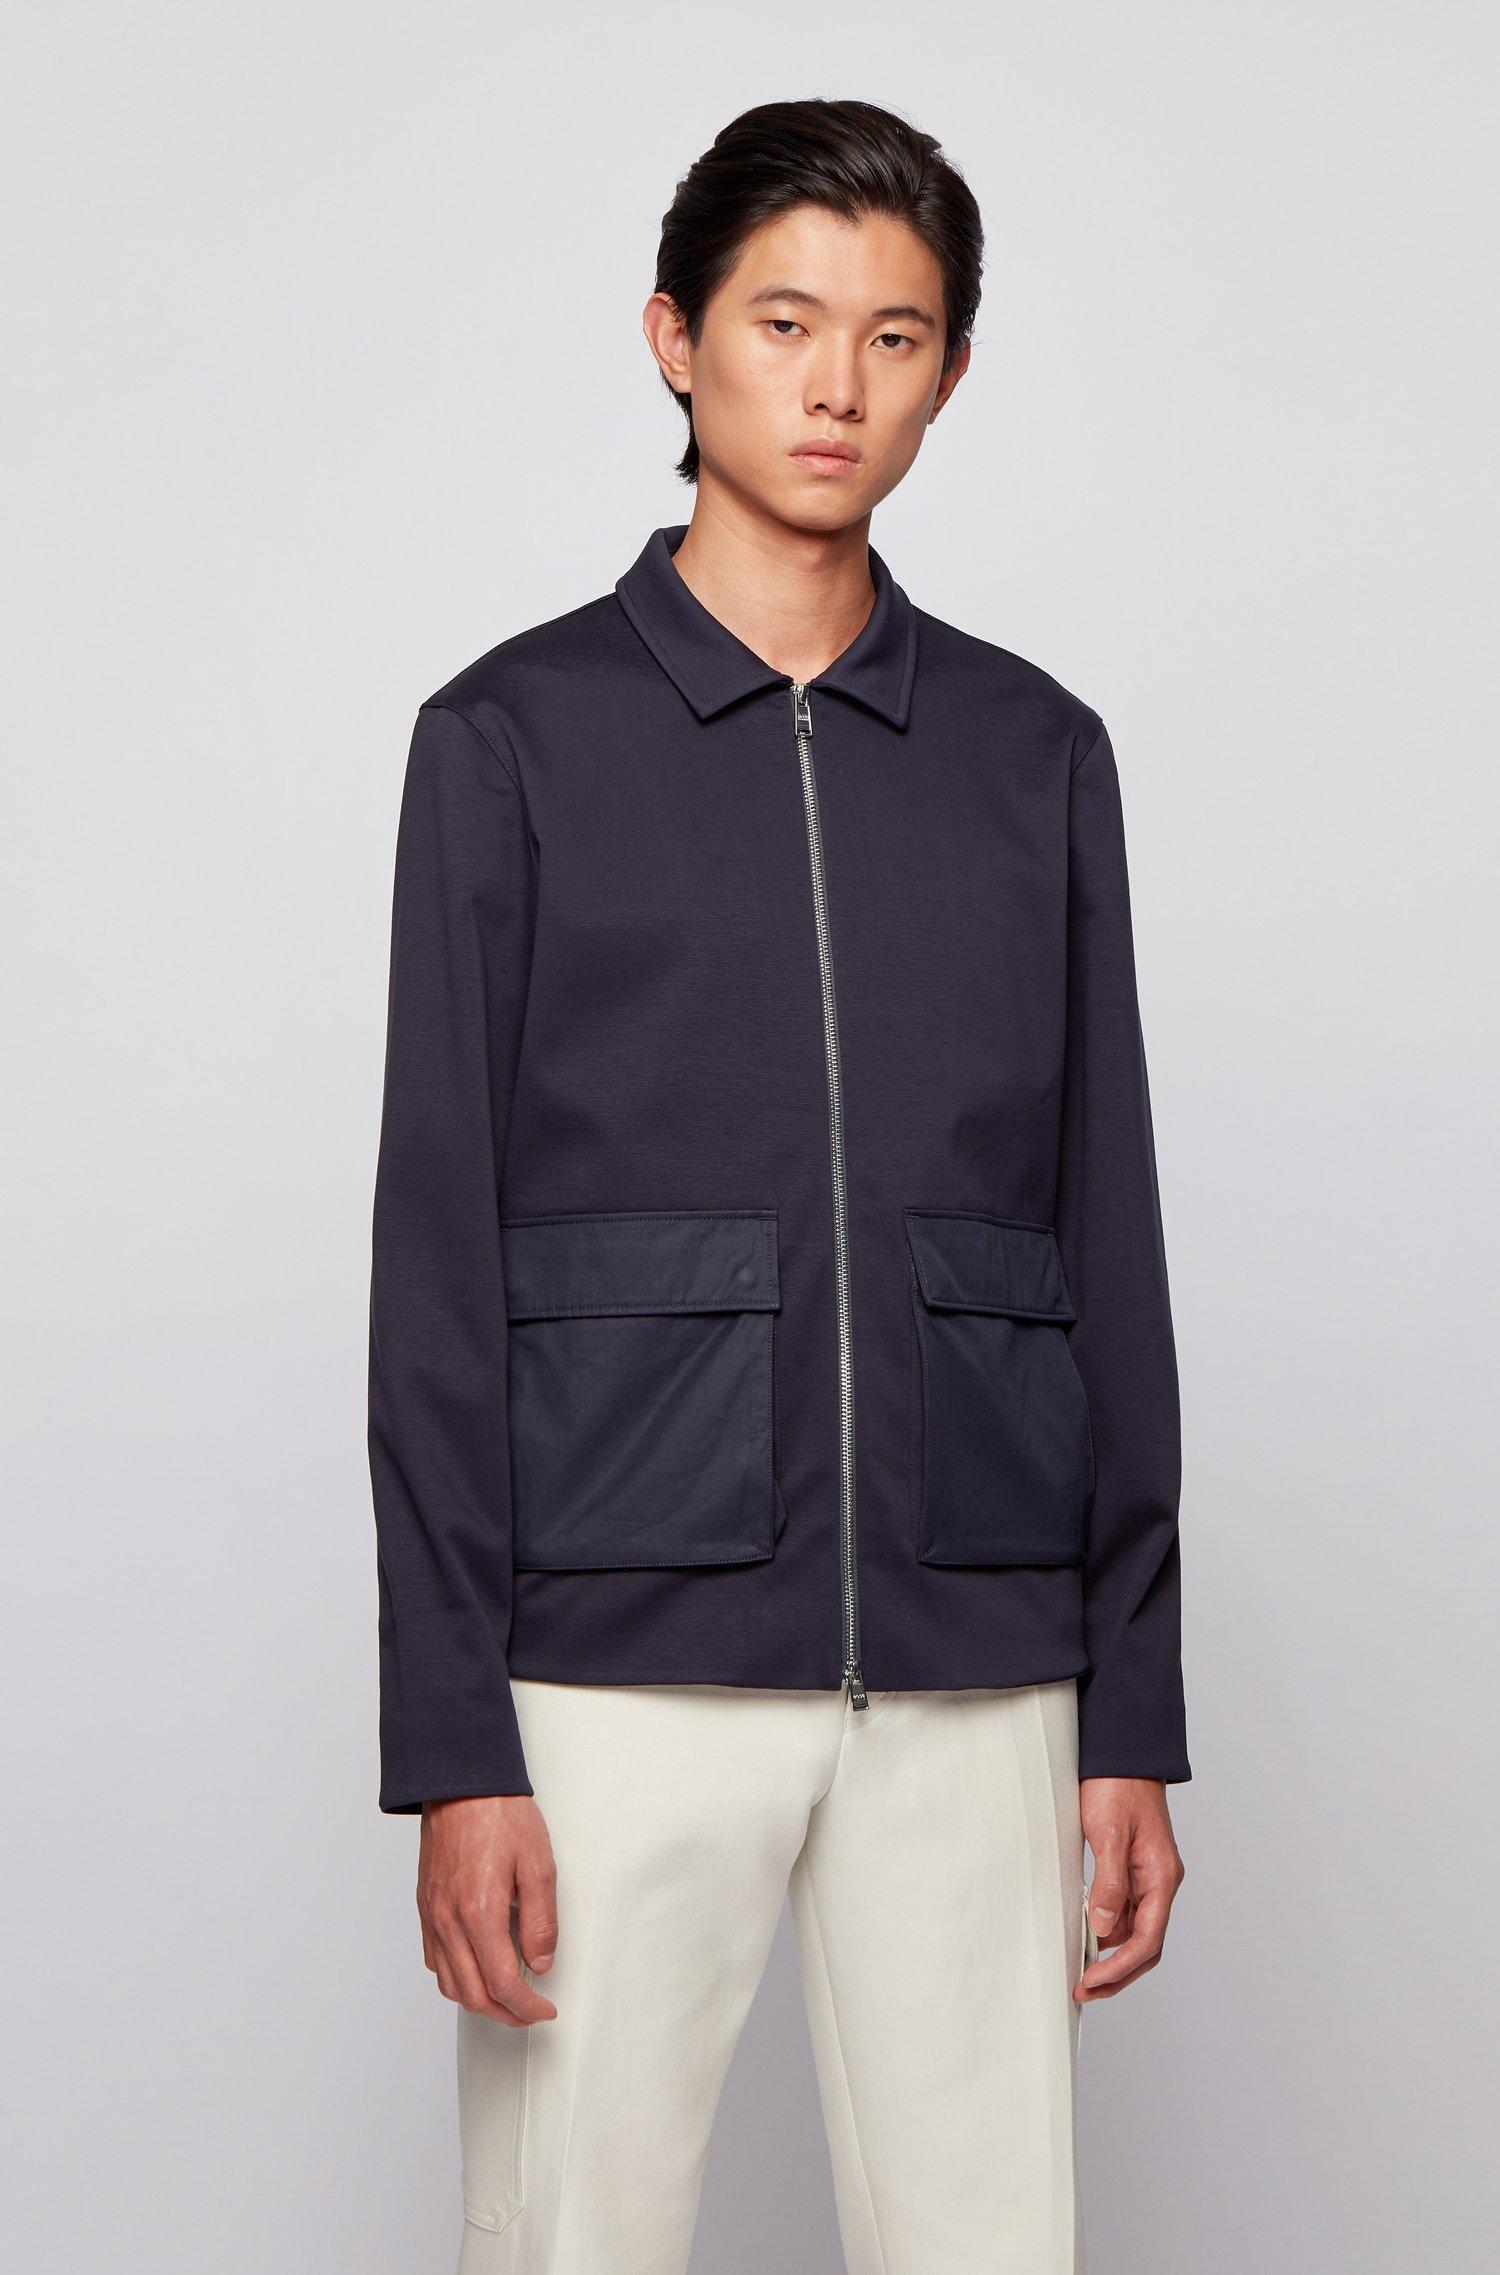 Cotton-blend zip-up sweatshirt with patched pockets, Dark Blue